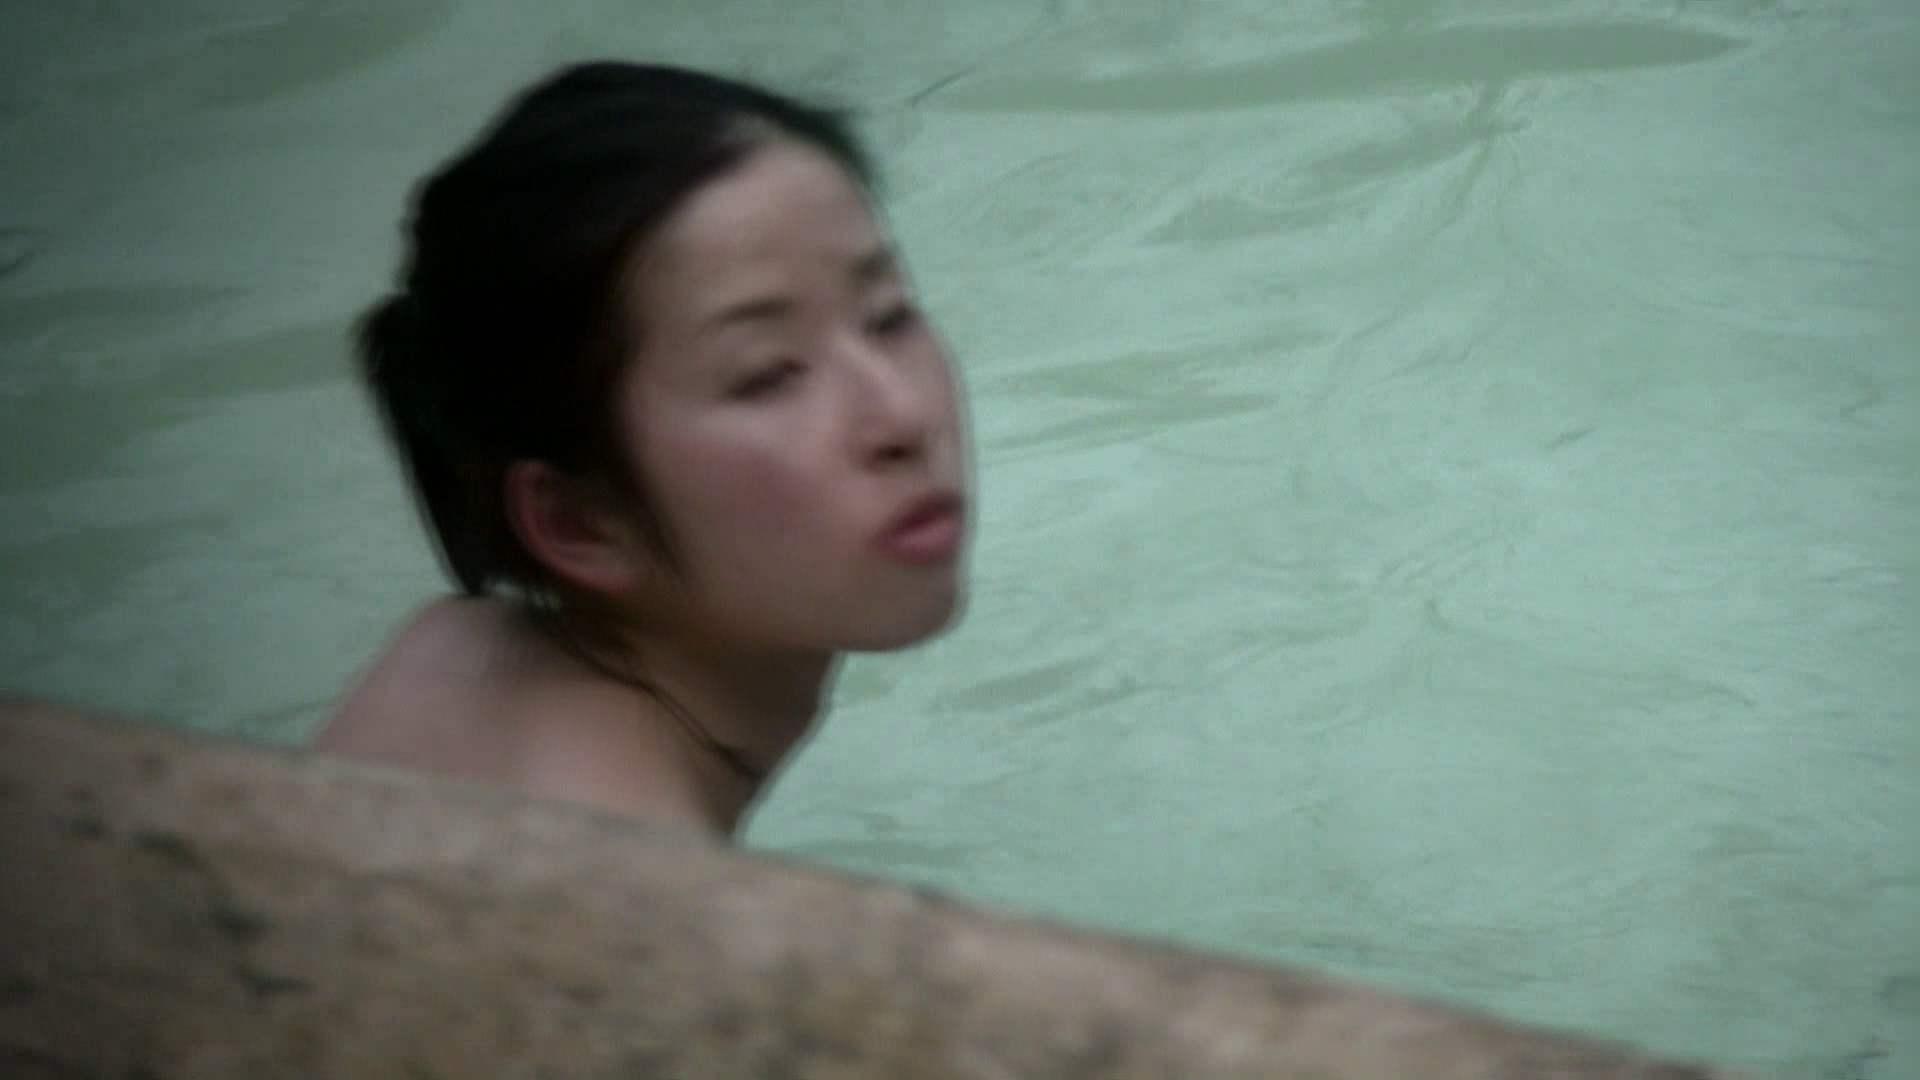 Aquaな露天風呂Vol.656 露天   HなOL  71pic 22